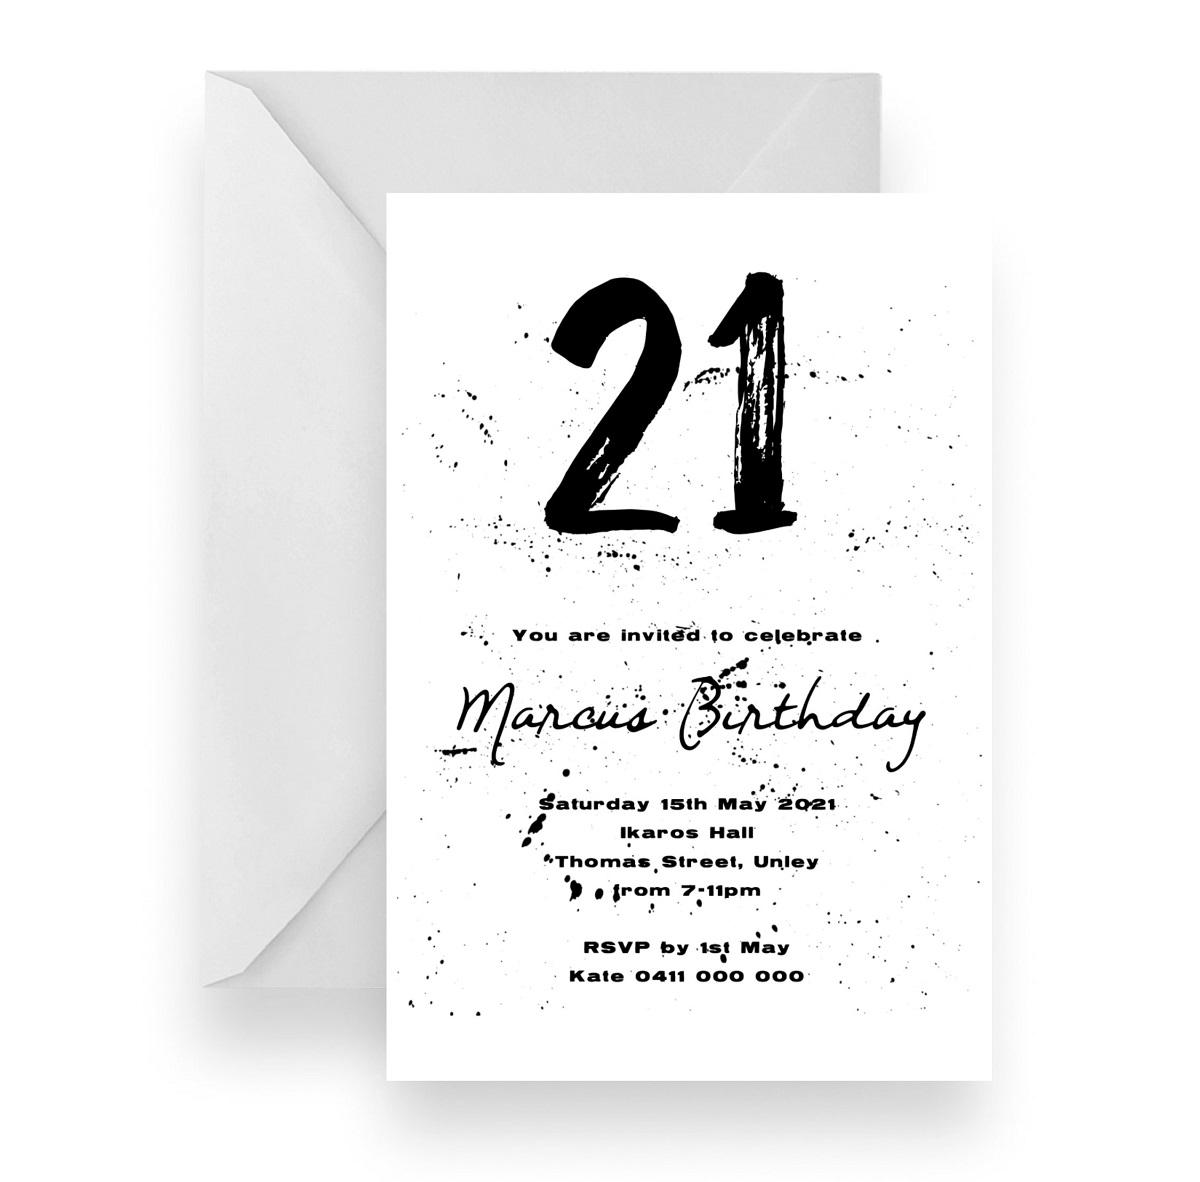 225 Paint Splat Birthday Invitaiton v2